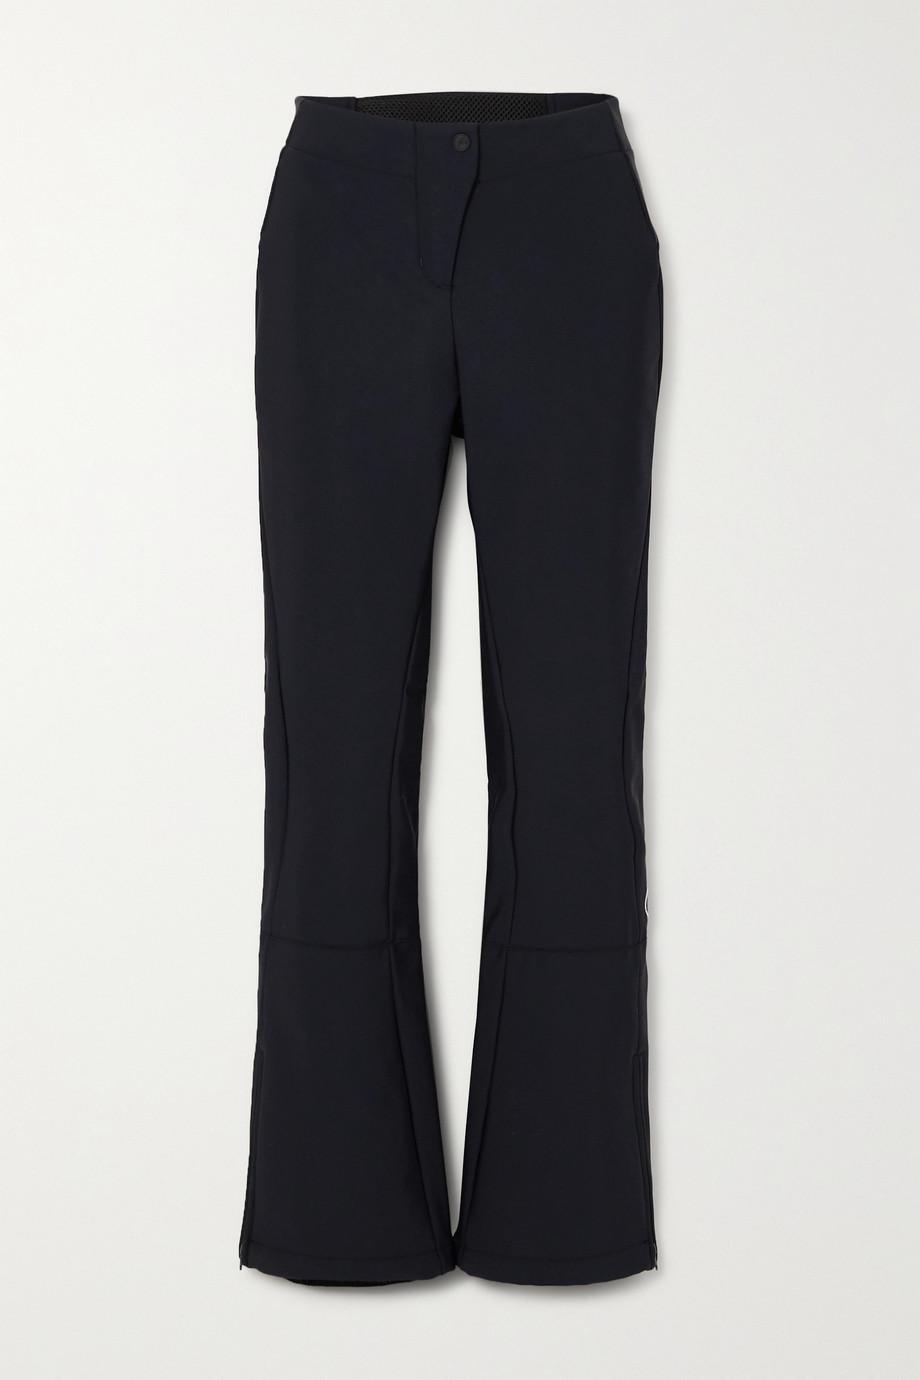 Fusalp Tipi III bootcut ski pants